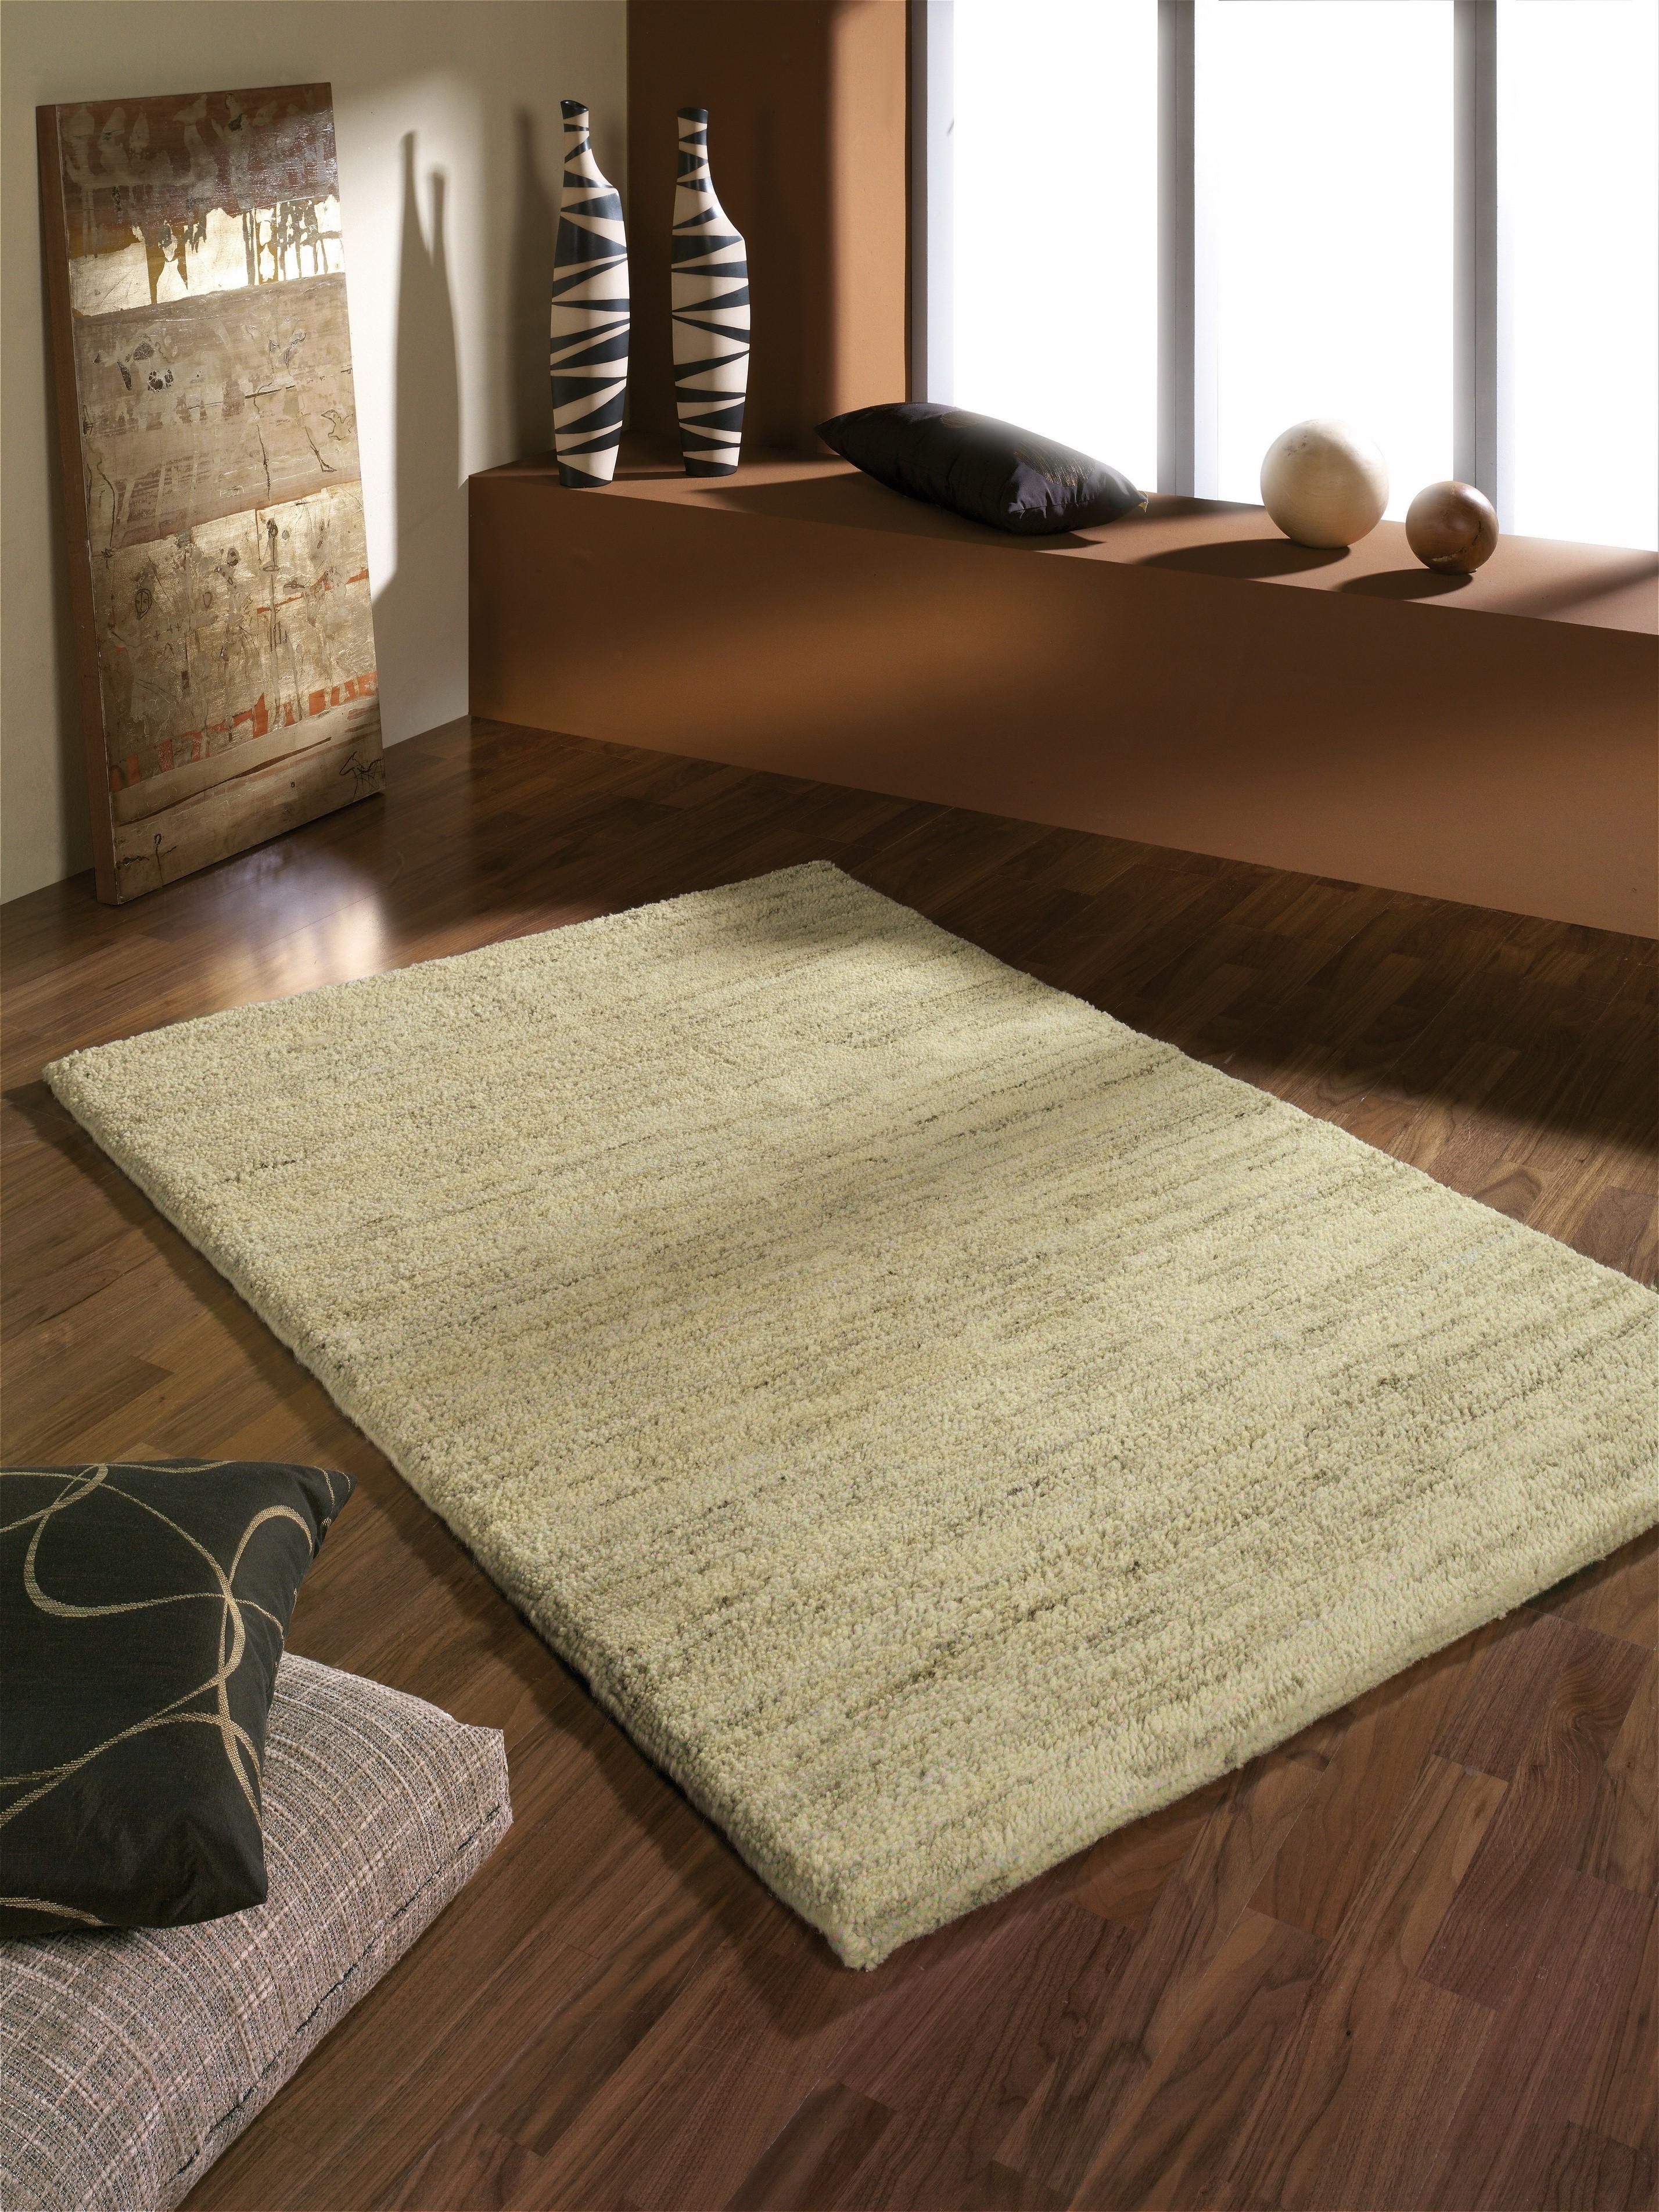 teppich kaufen jetzt buero teppiche teppich antrazit teppiche rottoene. Black Bedroom Furniture Sets. Home Design Ideas